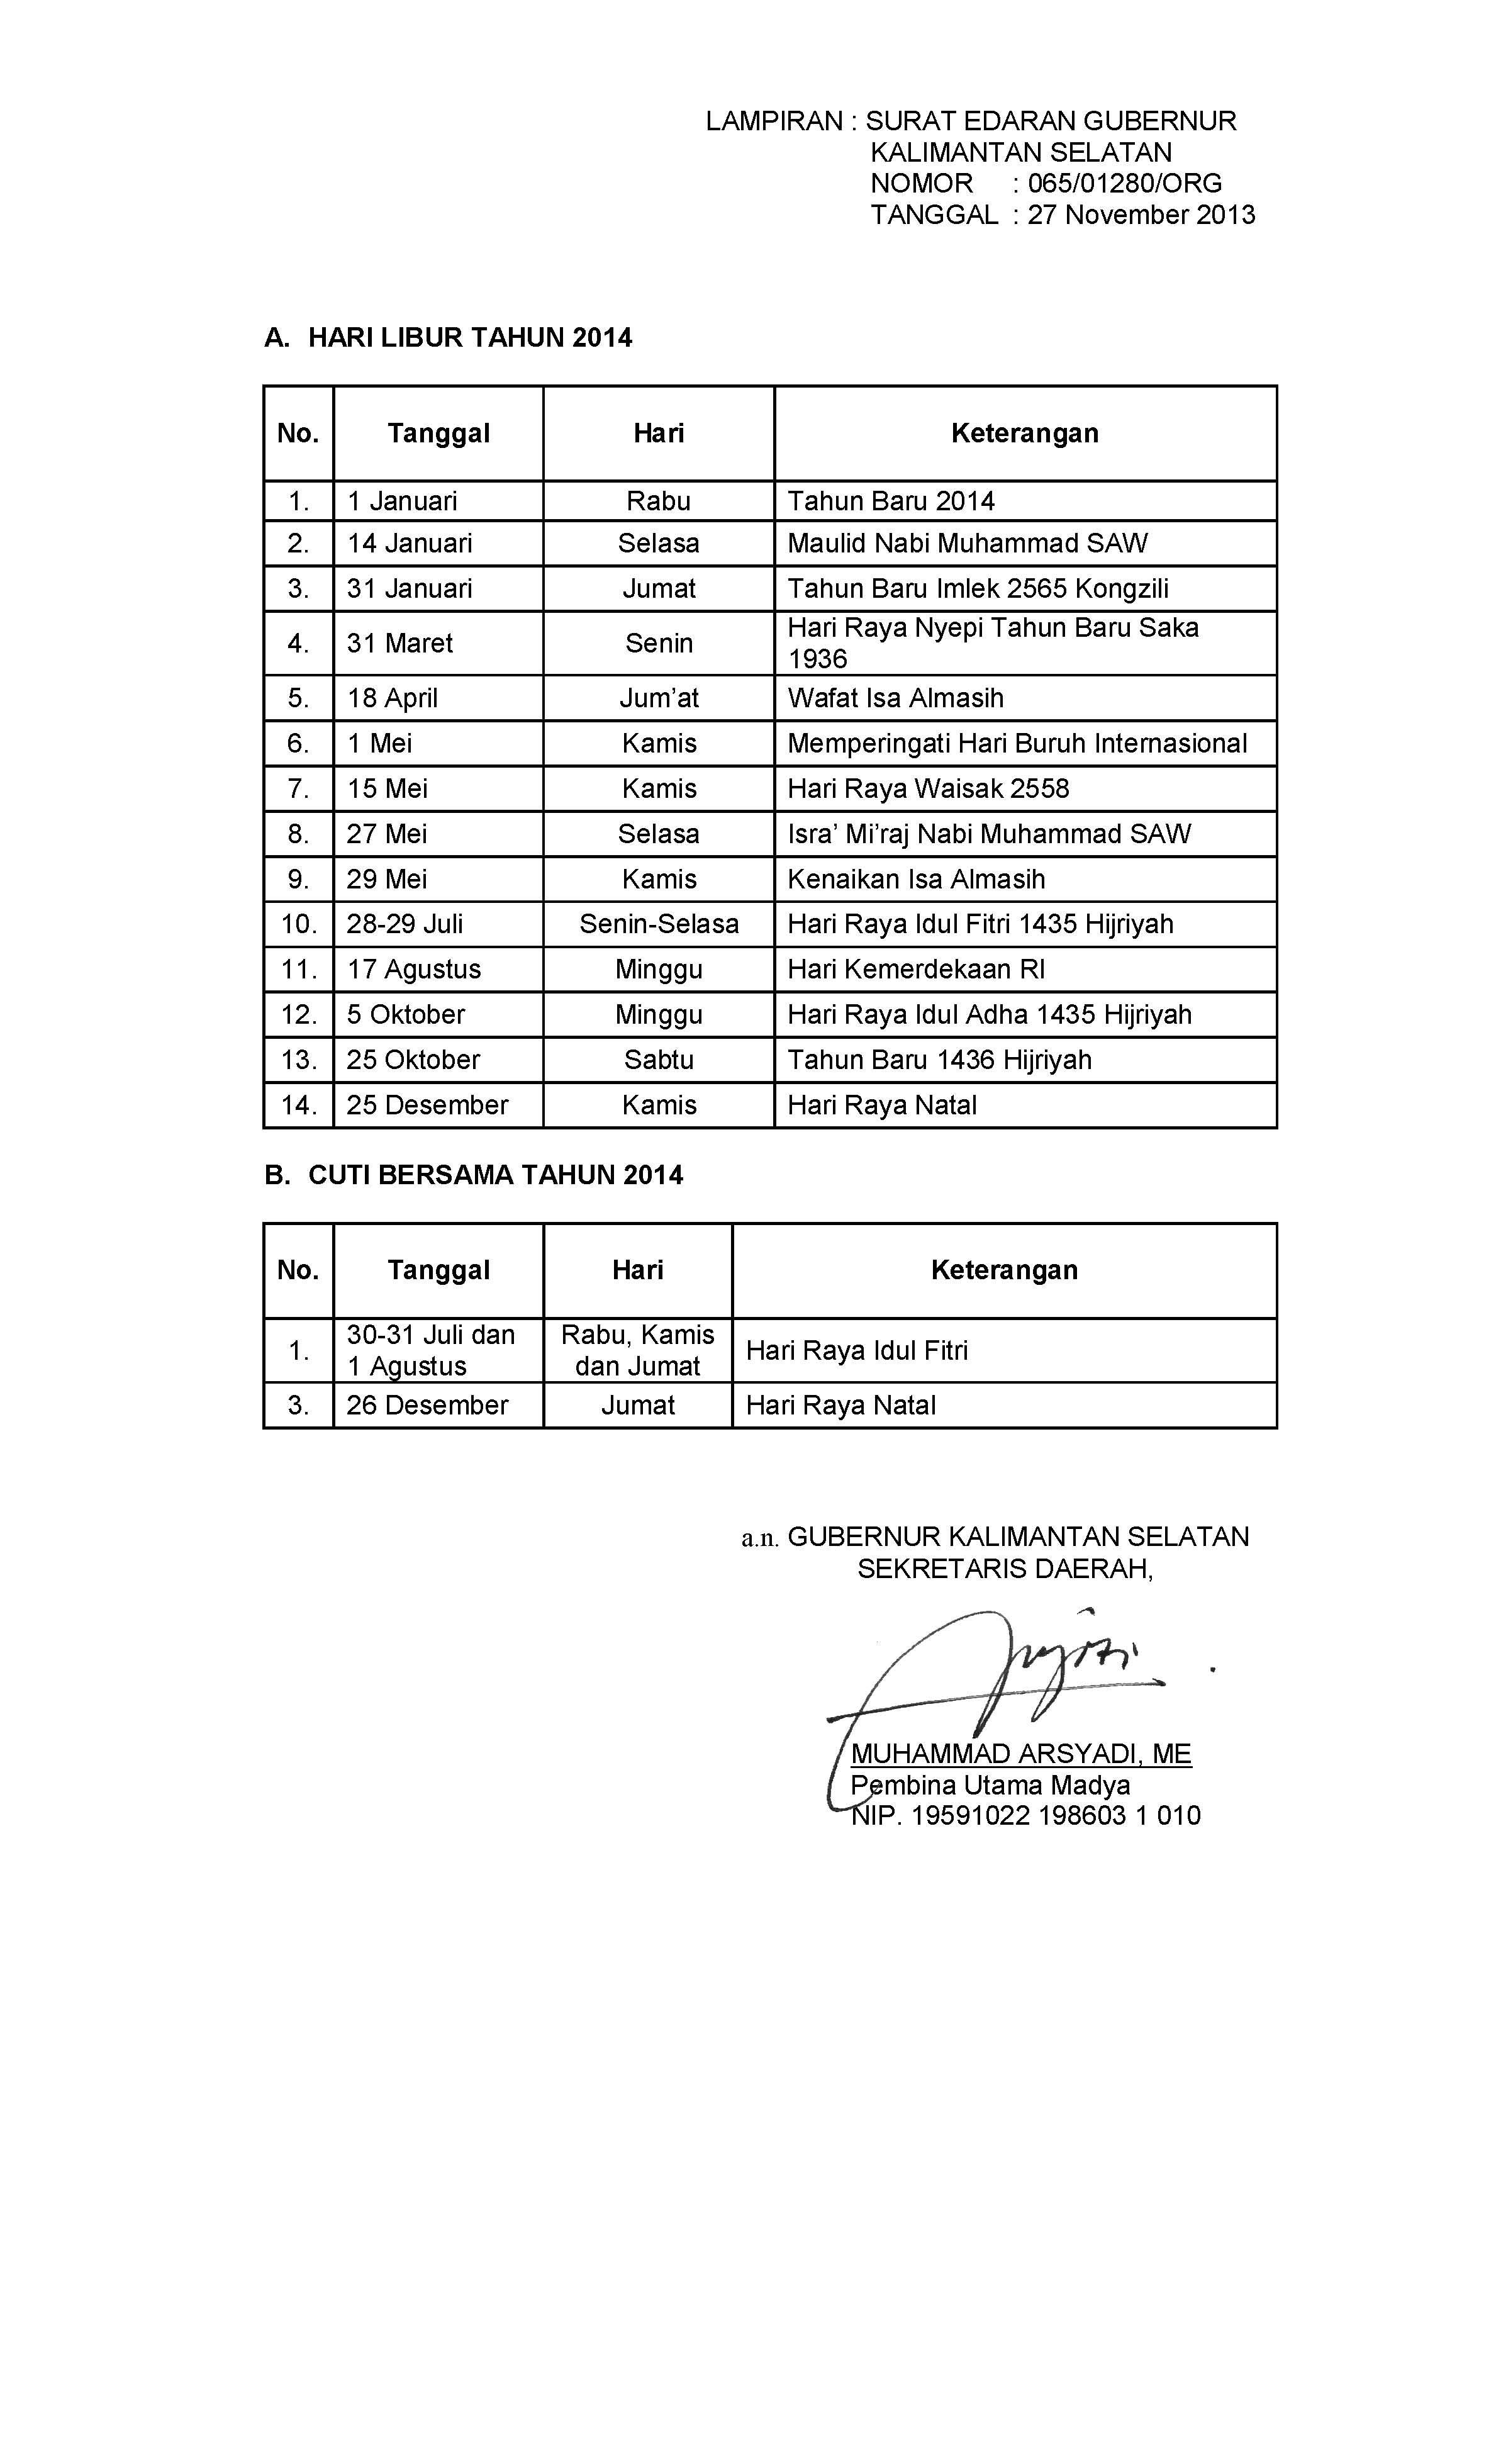 Surat Edaran Nomor 065/01280/ORG Tahun 2013 Tentang Hari